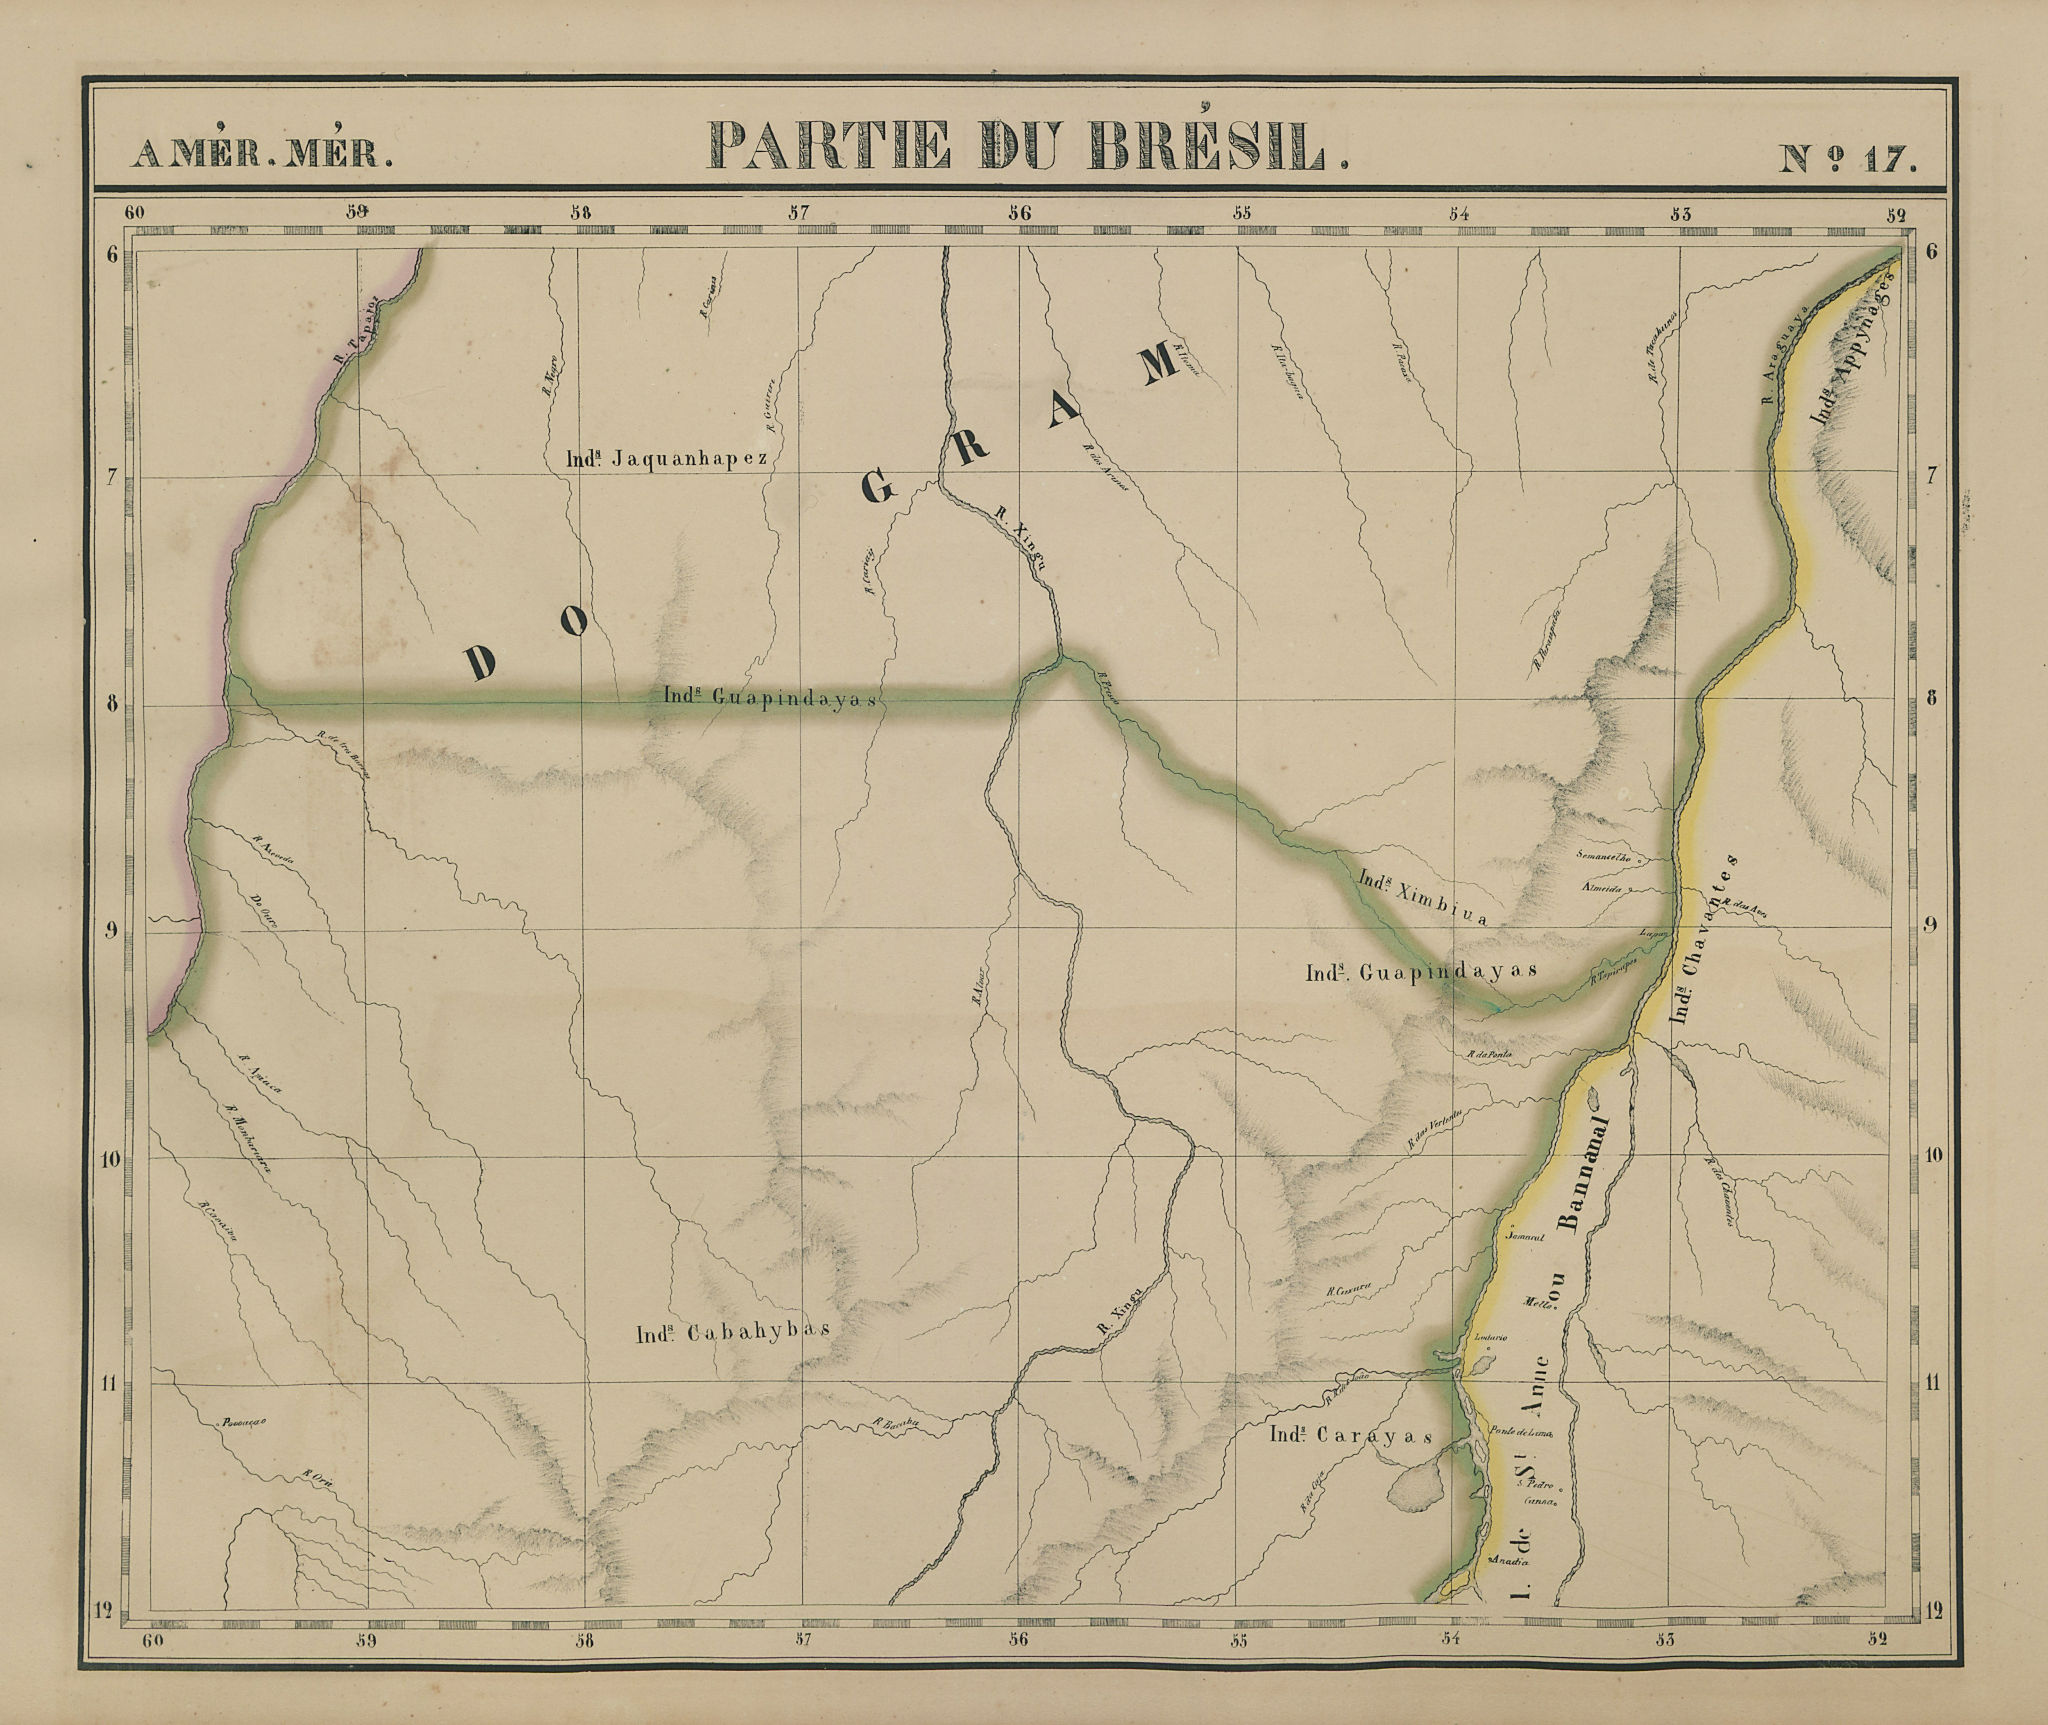 Amér. Mér. Brésil #17. NE Mato Grosso & SW Para, Brazil. VANDERMAELEN 1827 map